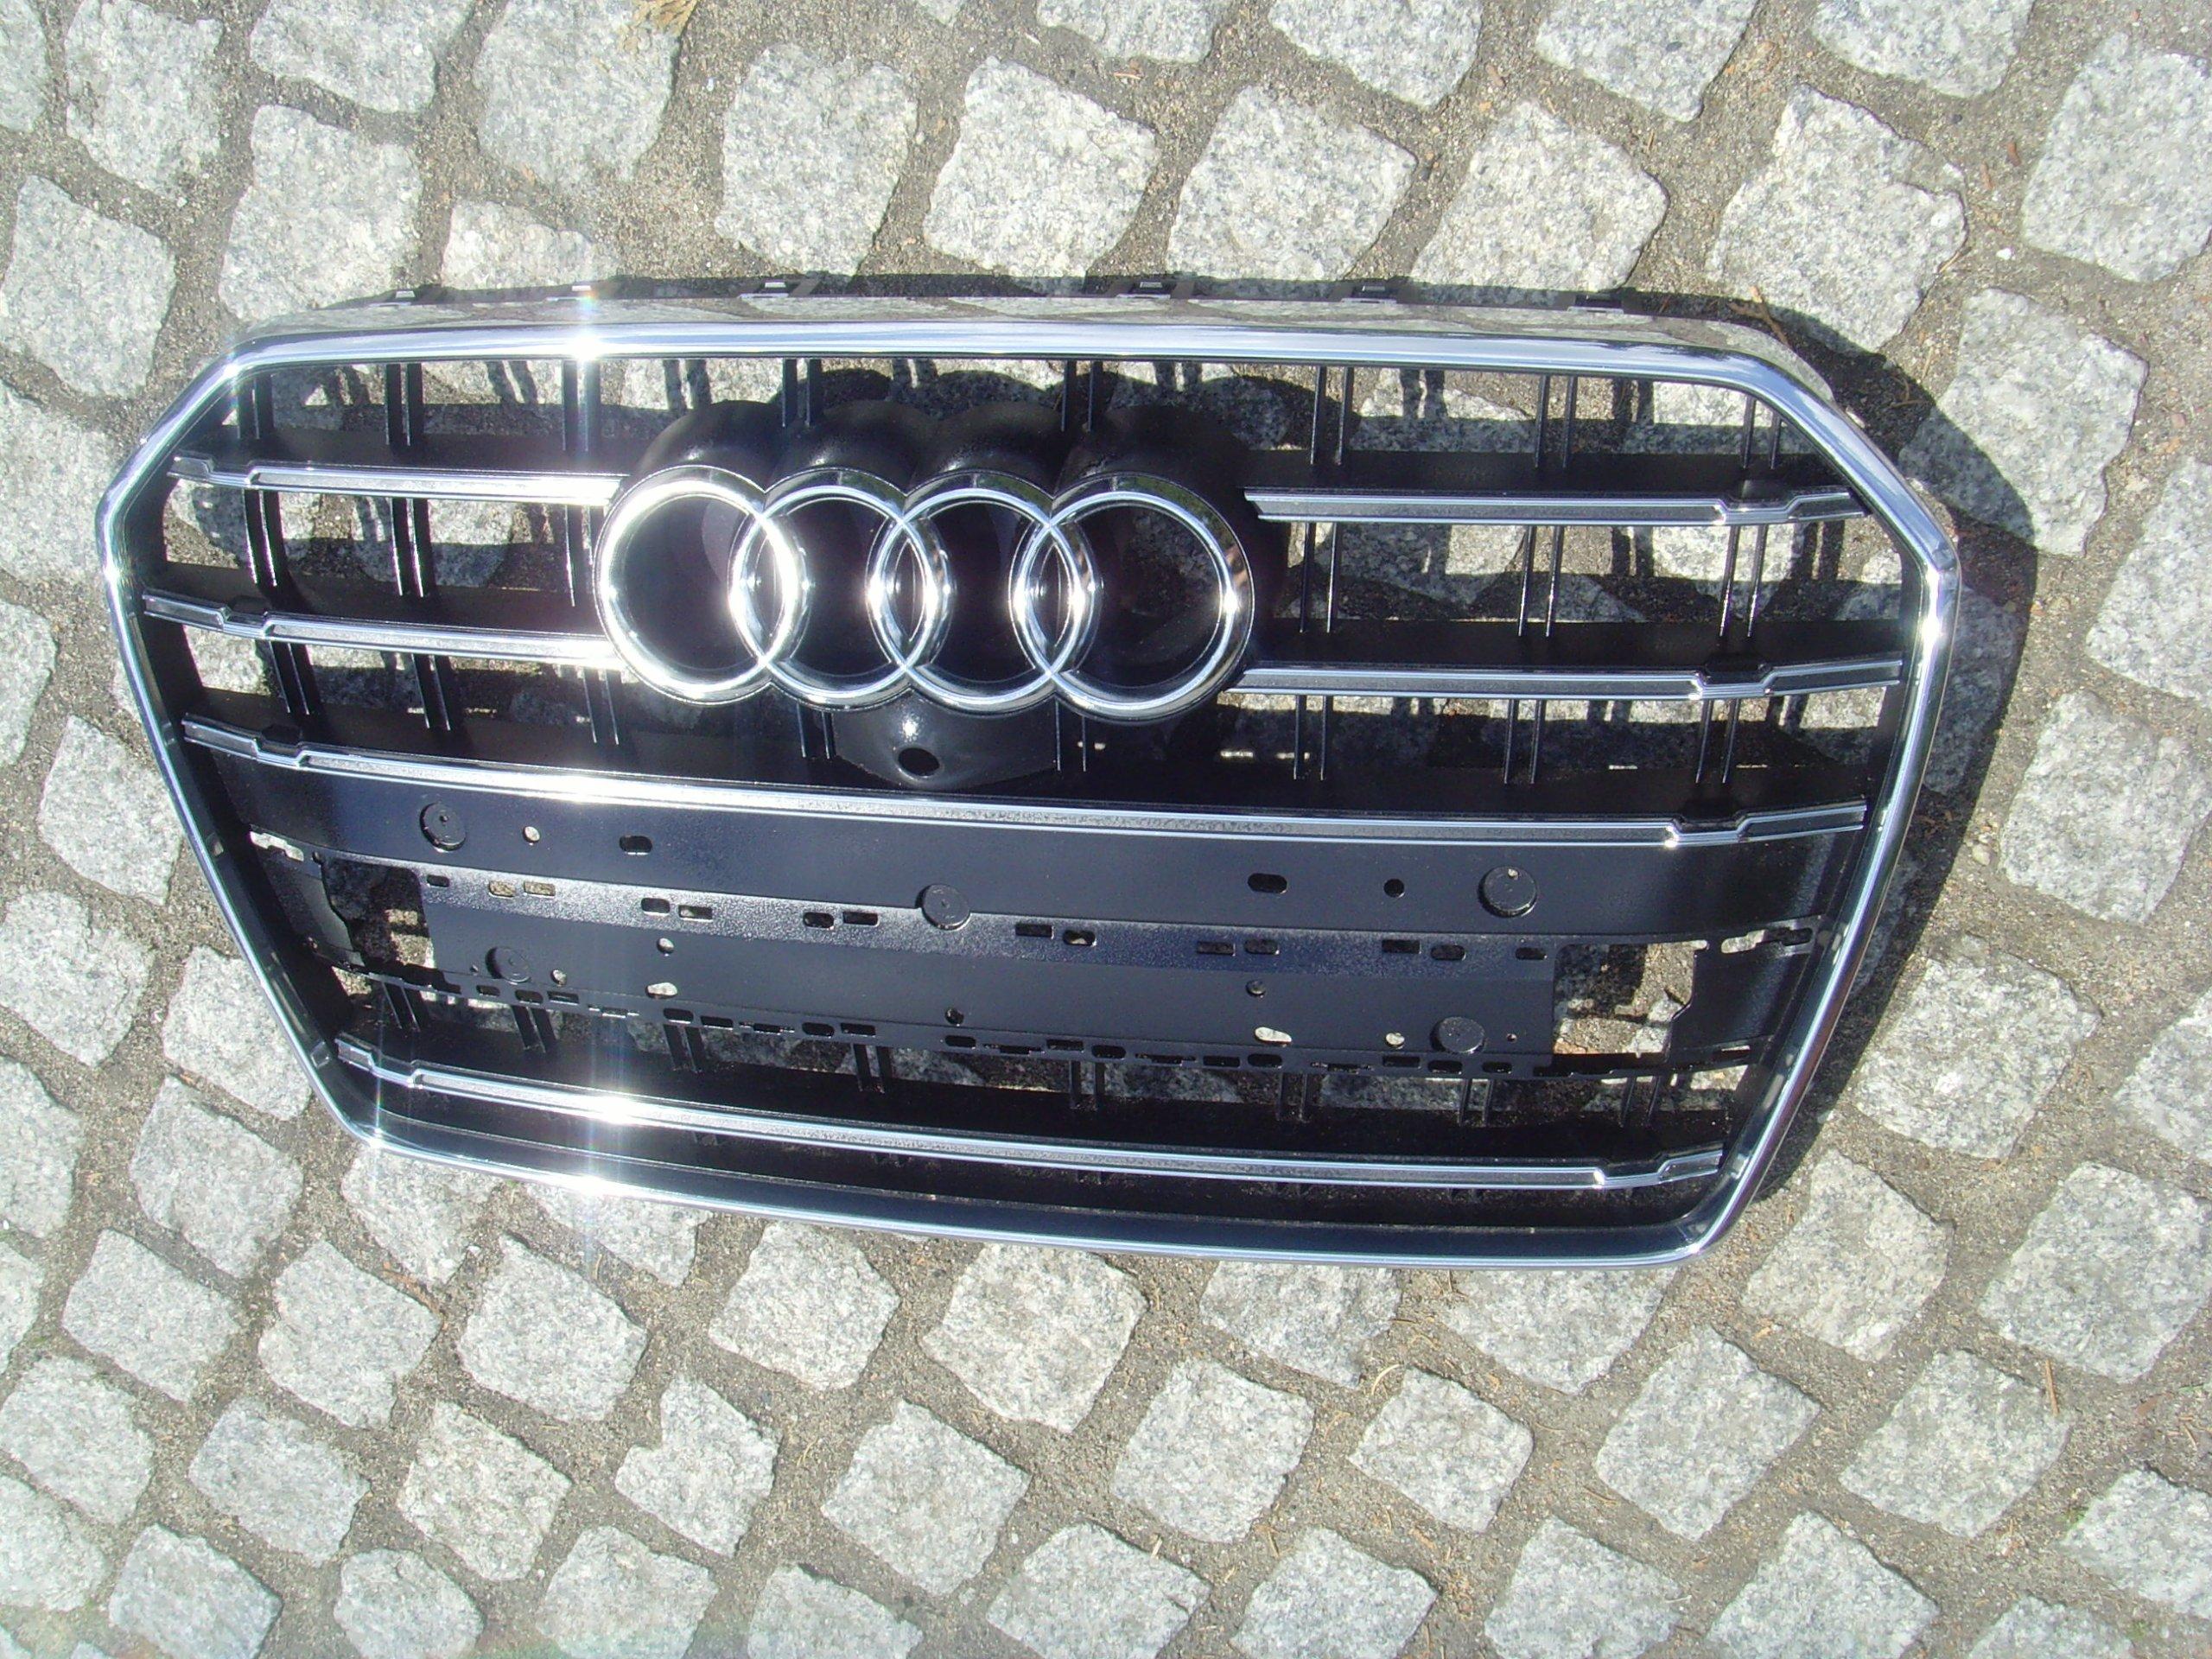 Audi A6 C7 S6 4g Facelift Grill Grill Black S Line Xdalys Lt